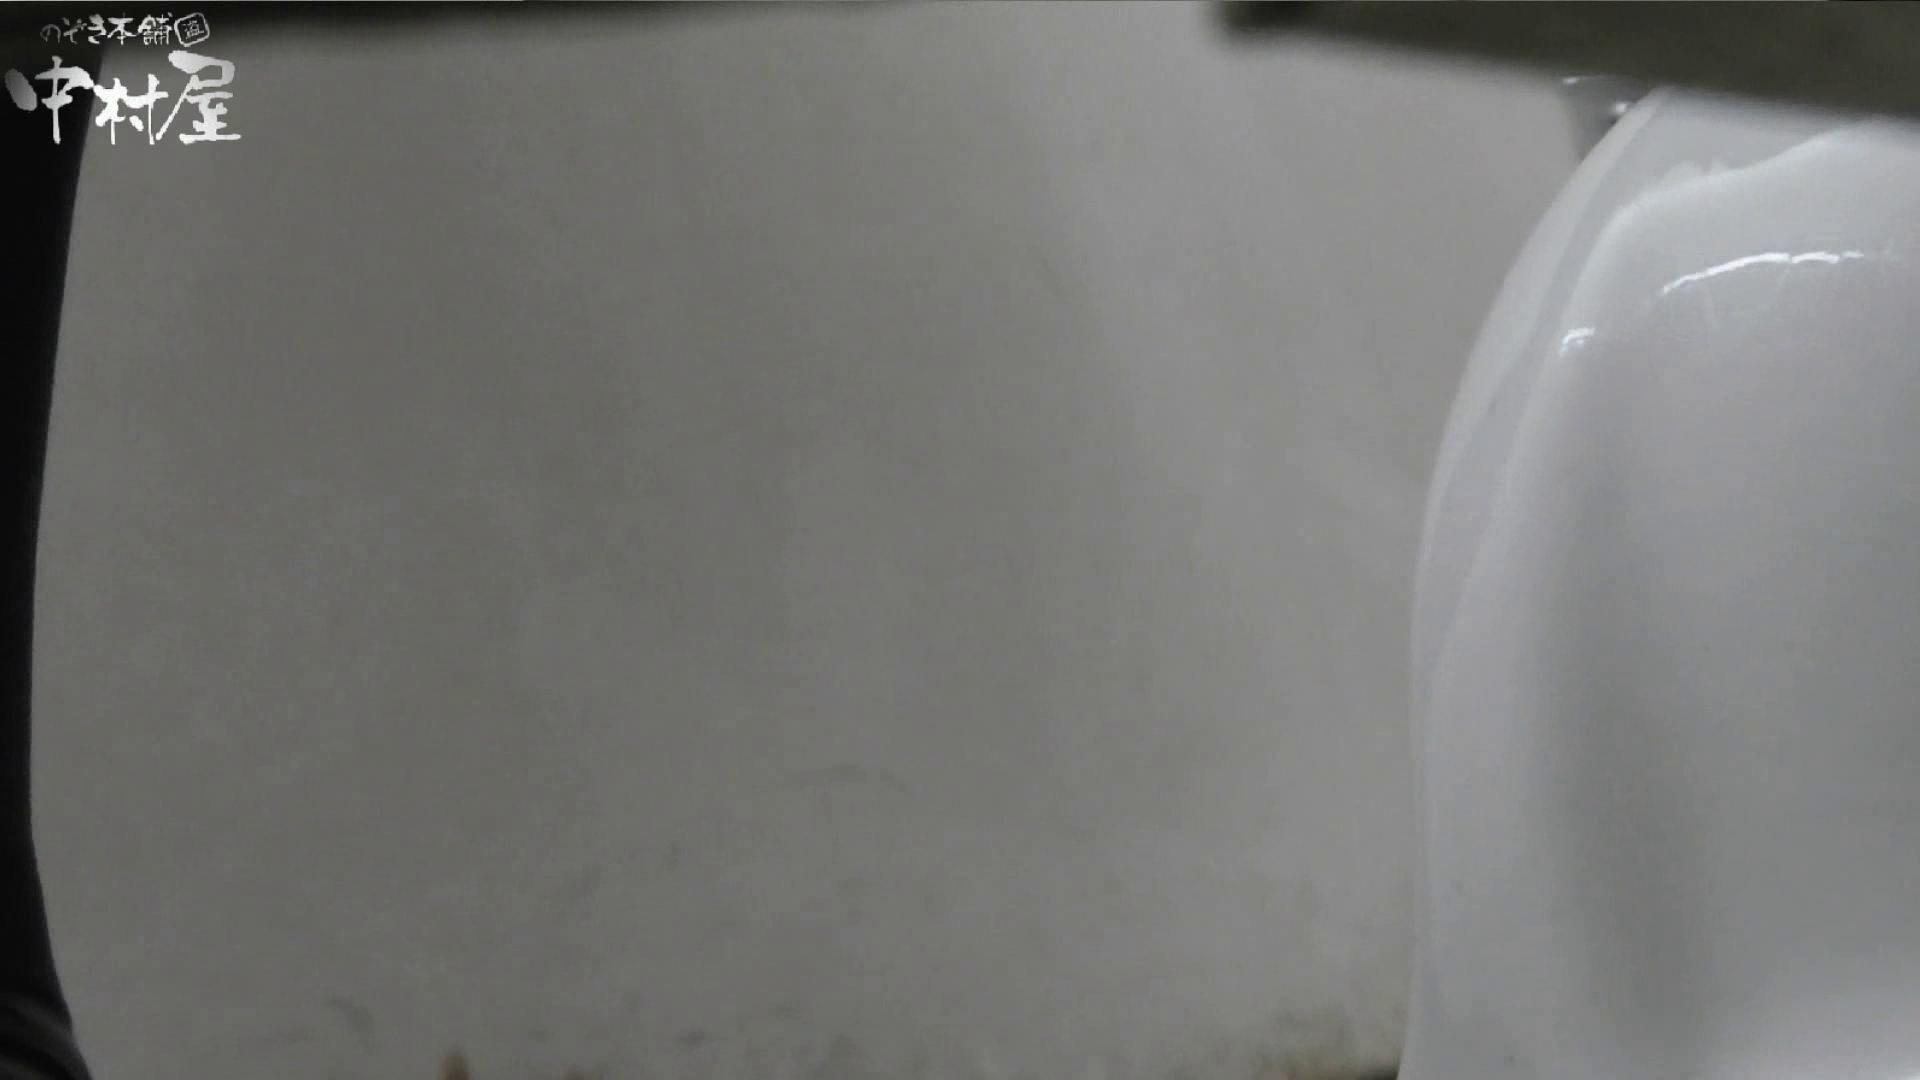 vol.25 命がけ潜伏洗面所! 咥えタオルは剛毛の証!? プライベート アダルト動画キャプチャ 72pic 23